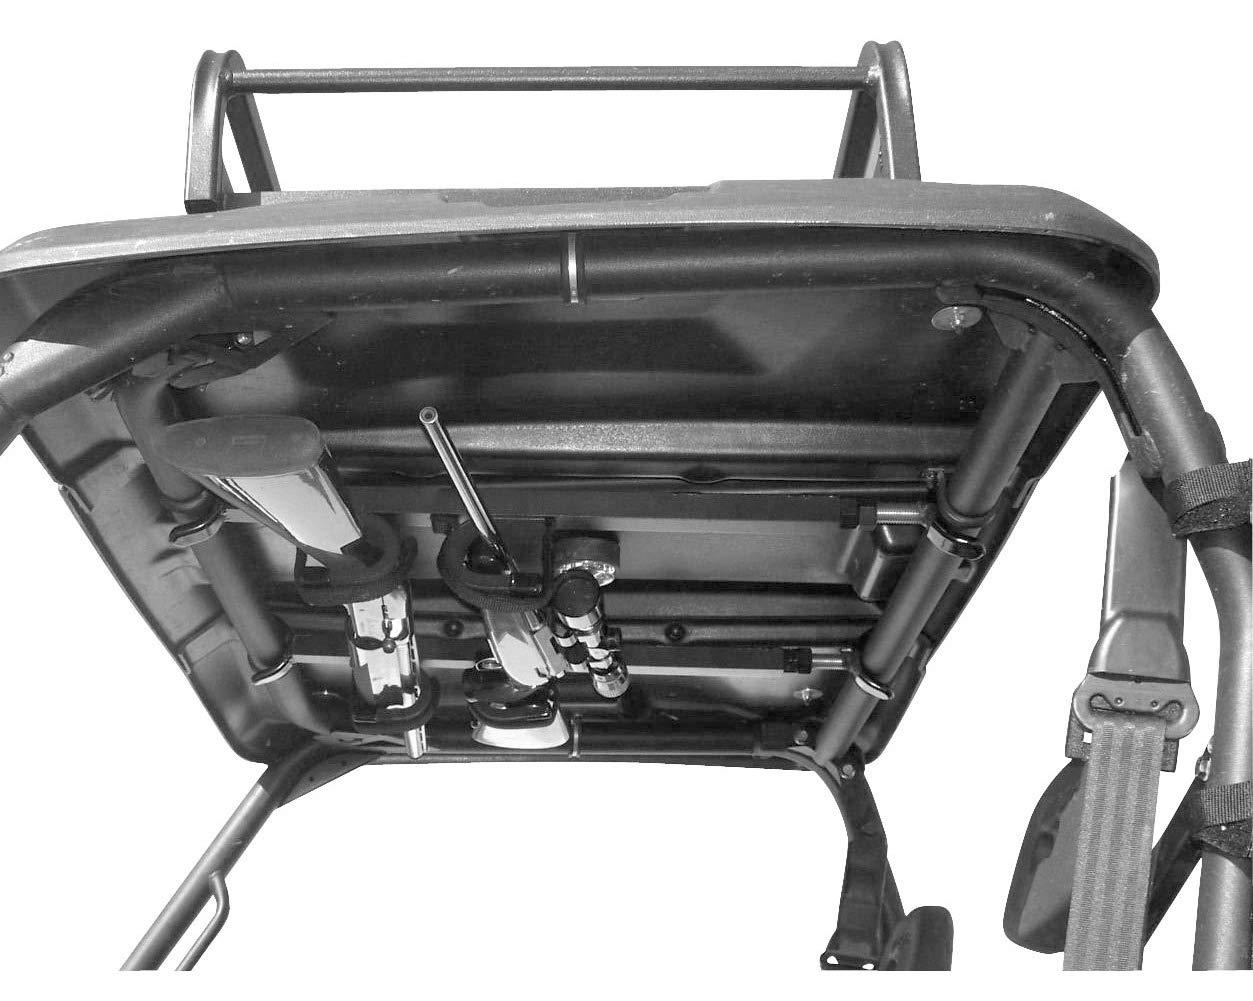 Great Day Quick-Draw Overhead Gun Rack - For UTVs With Roll Bar Depth of 28-35in - Black Powder-Coated Finish - 2 Gun Model, QD851-OGR